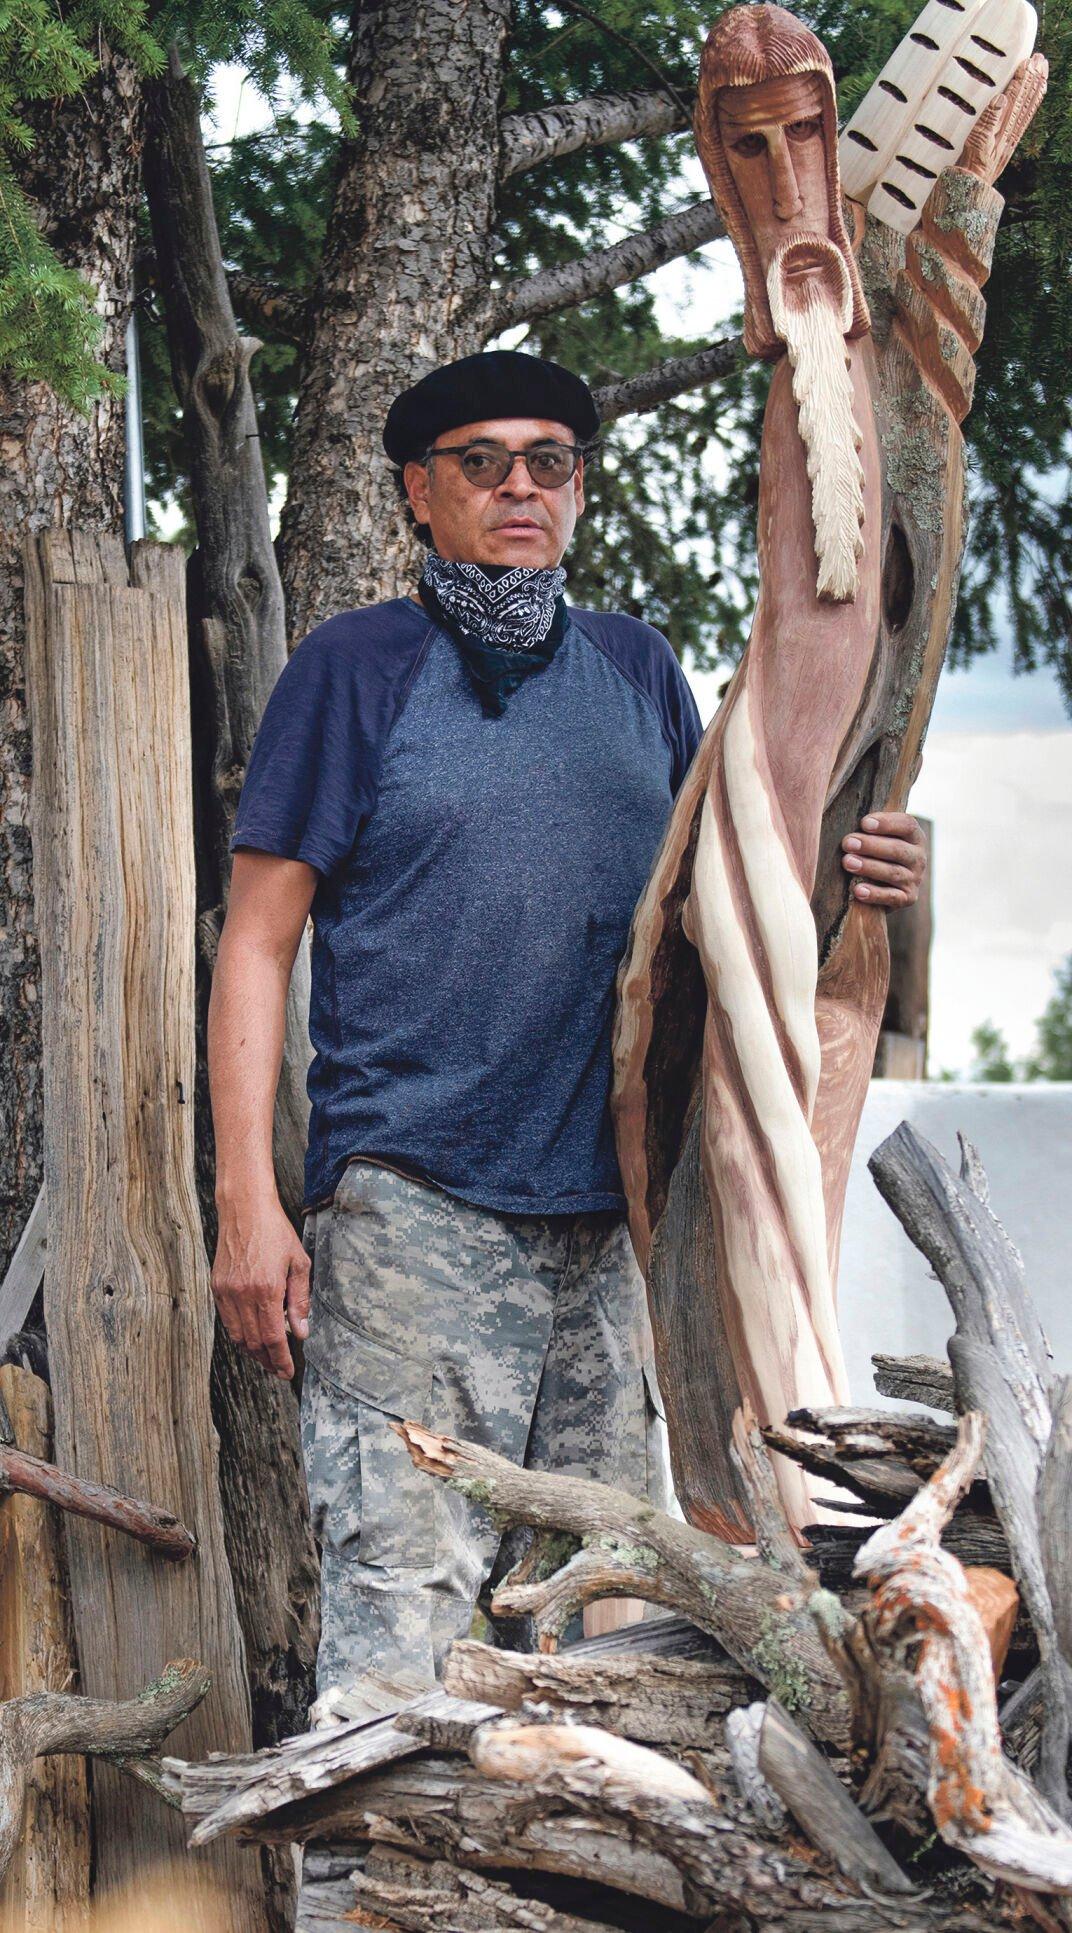 Artes-Sculptor-01.jpg